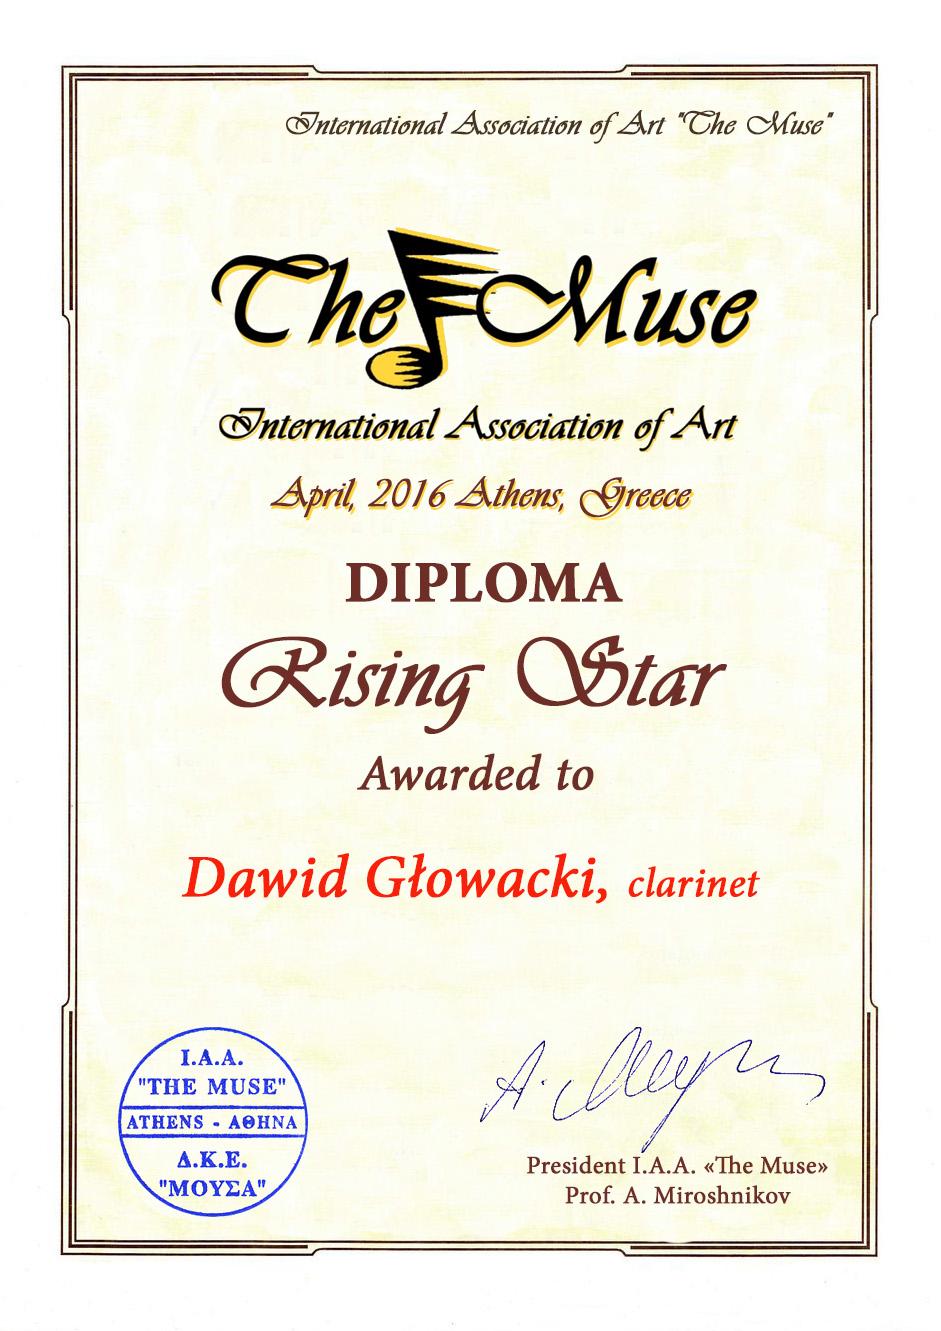 eMuse_Rising Star_Dawid Glowacki